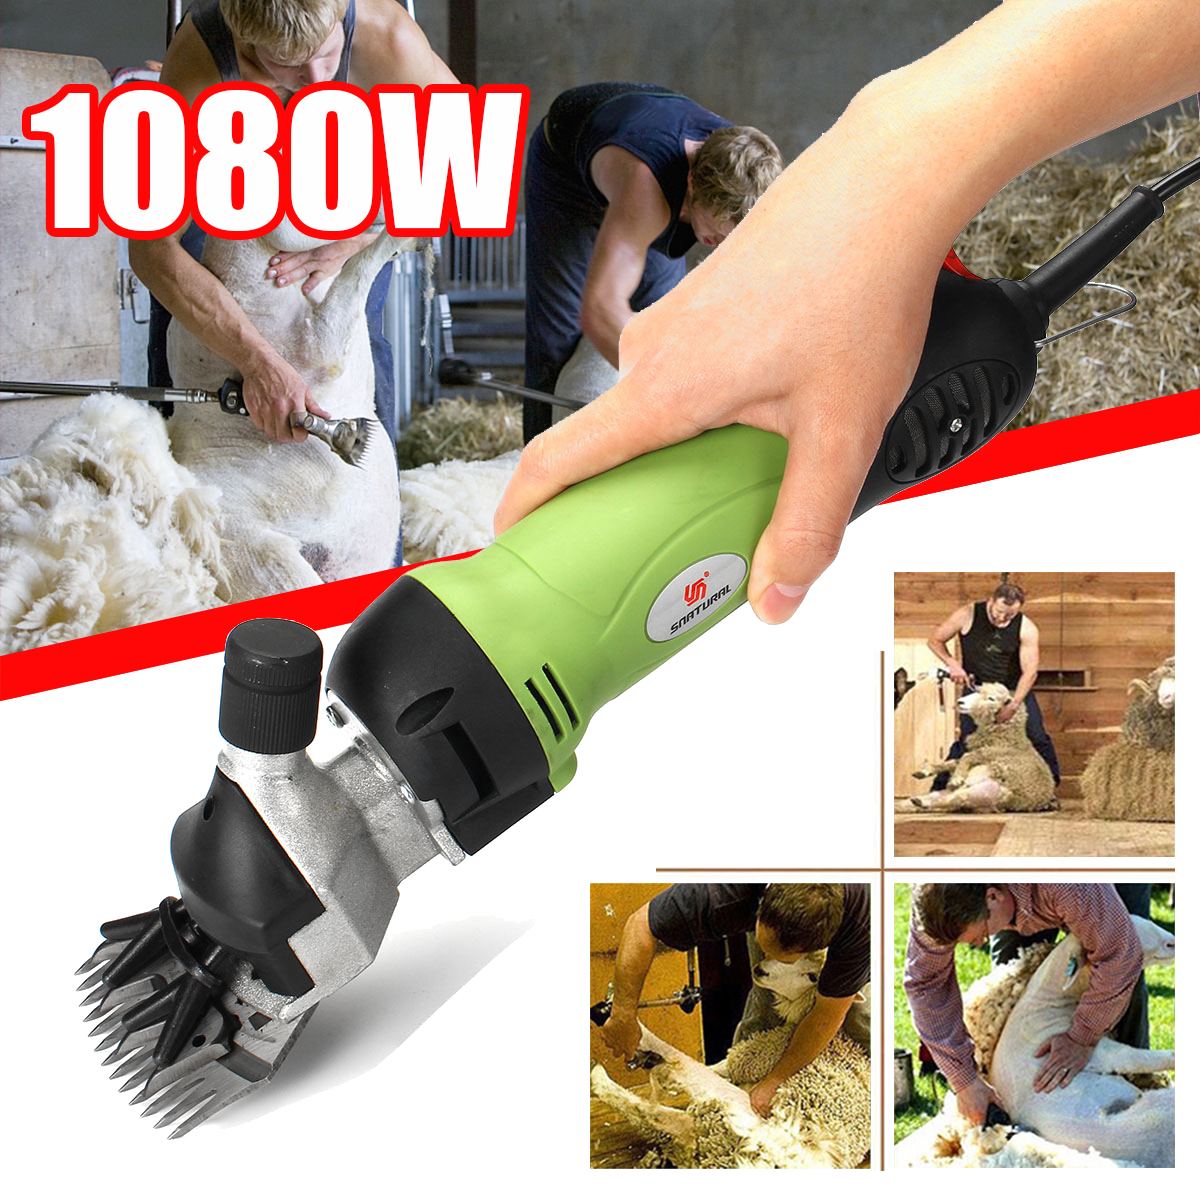 650W electric farm supplies sheep goat shears animal grooming shearing clipper